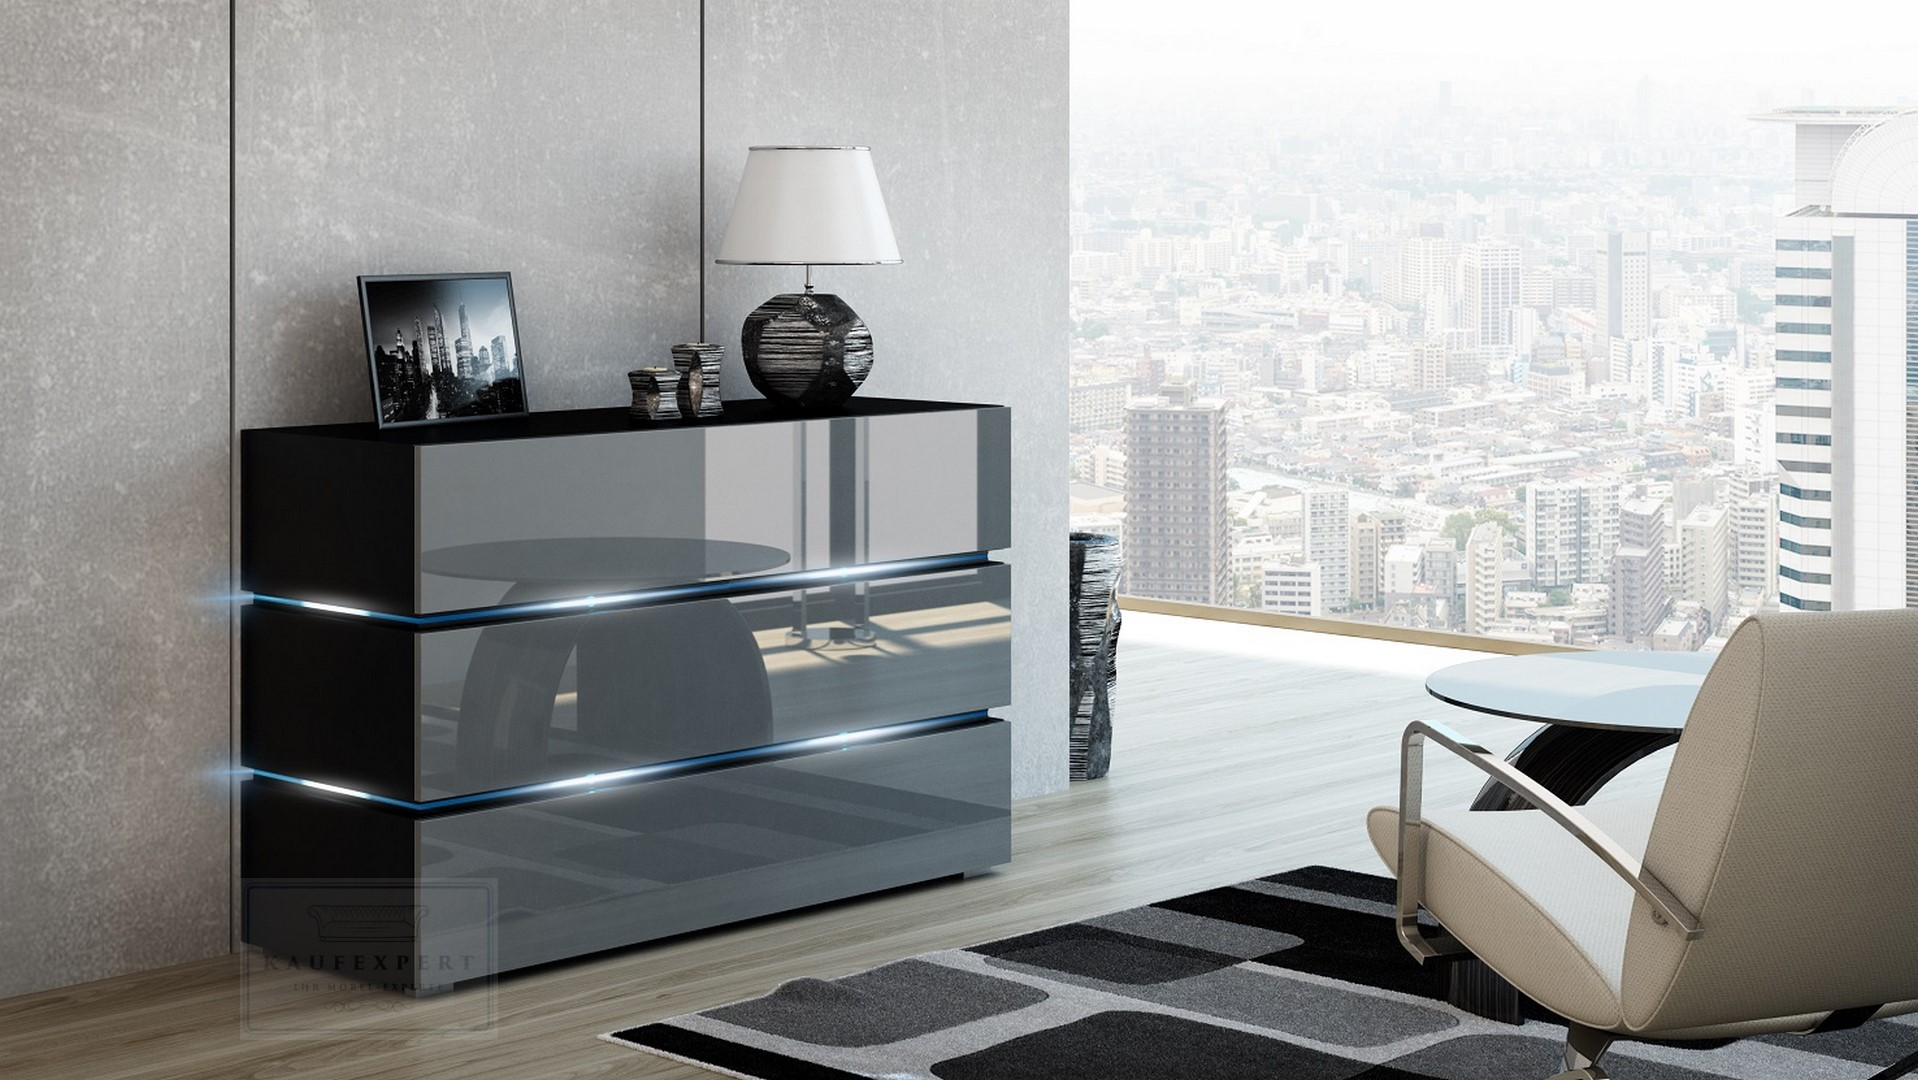 kaufexpert kommode shine sideboard 120 cm grau hochglanz schwarz led beleuchtung modern design. Black Bedroom Furniture Sets. Home Design Ideas